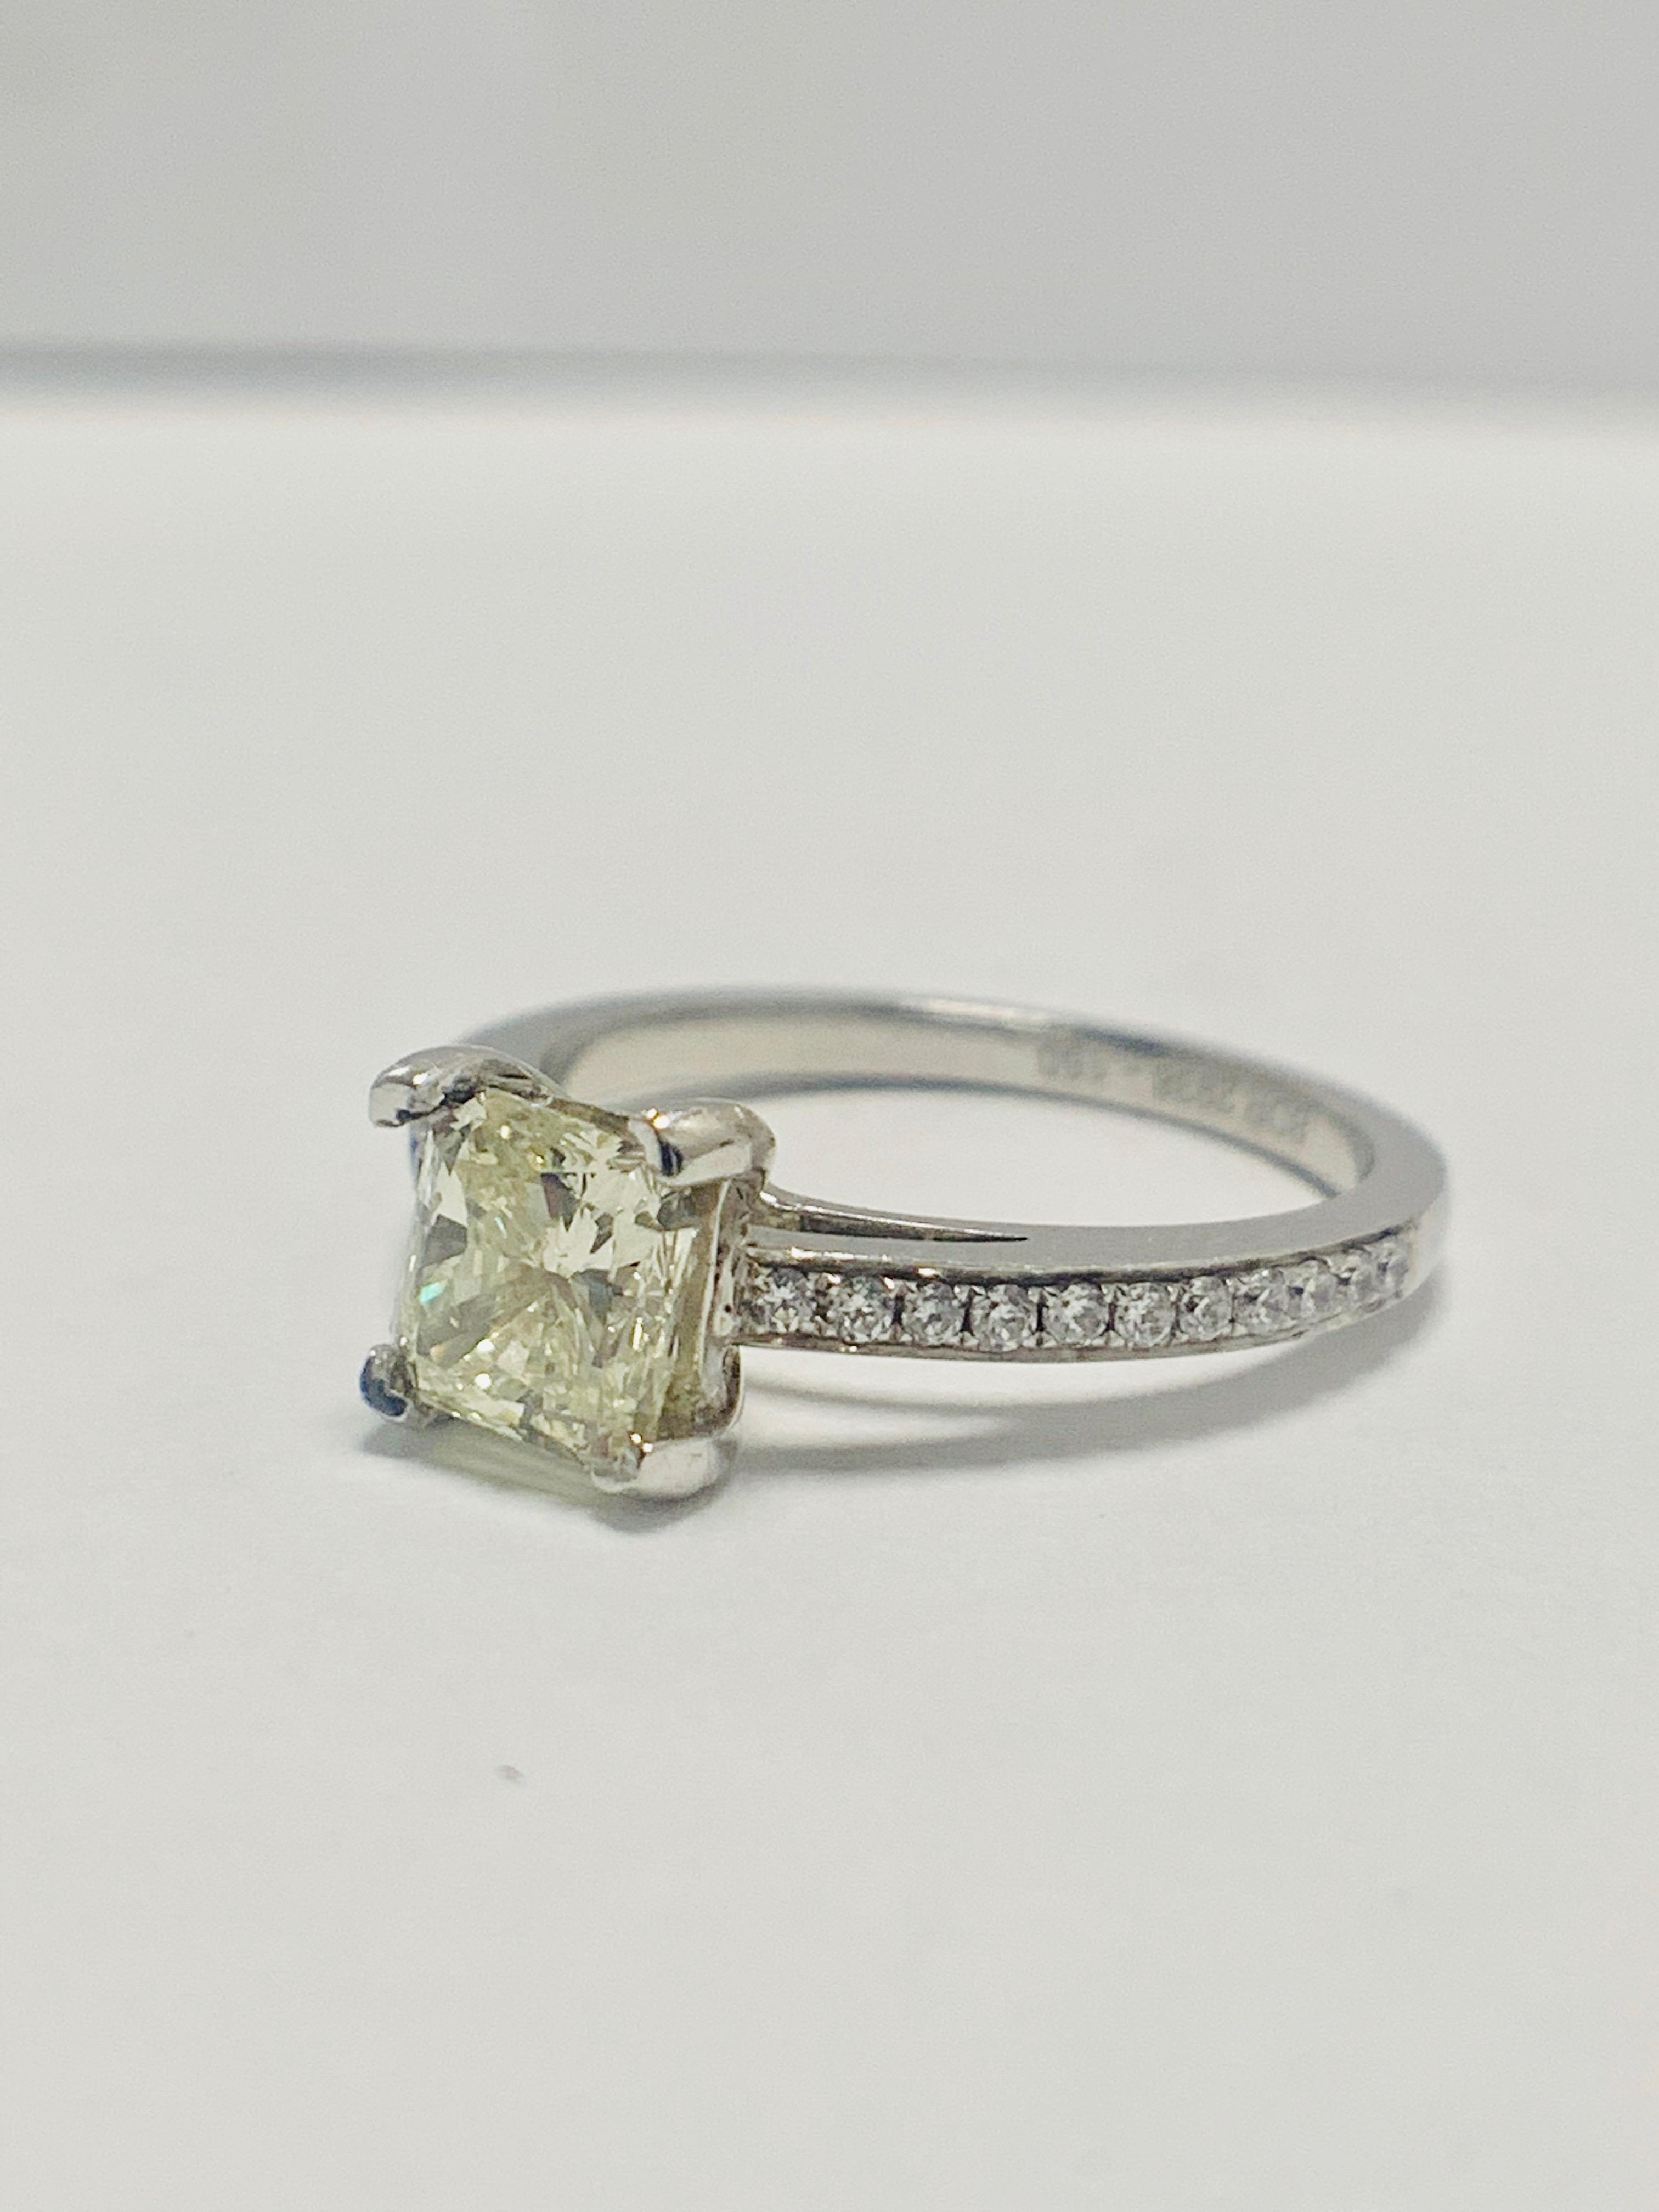 1ct cushion cut platinum diamond solitaire ring - Image 2 of 8